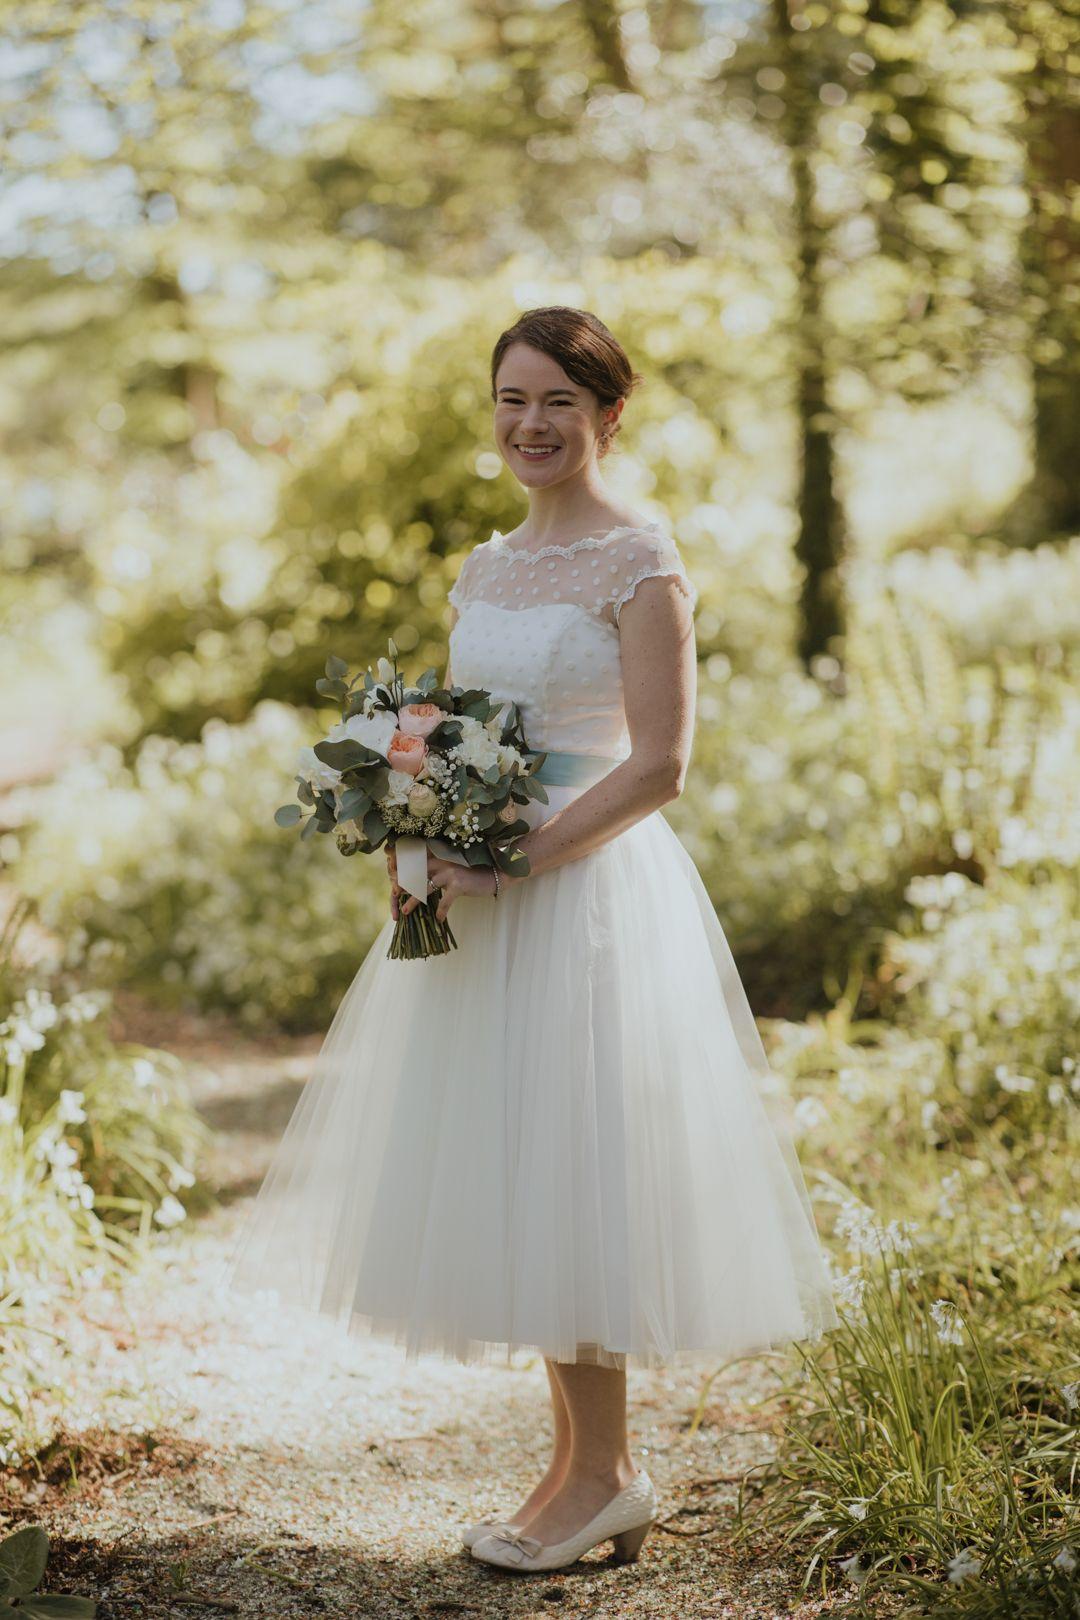 Sweet Simple And So Much Fun Olivia Donnacha Onefabday Com Tea Length Wedding Dress Short Wedding Dress Vintage Short Wedding Dress [ 1620 x 1080 Pixel ]